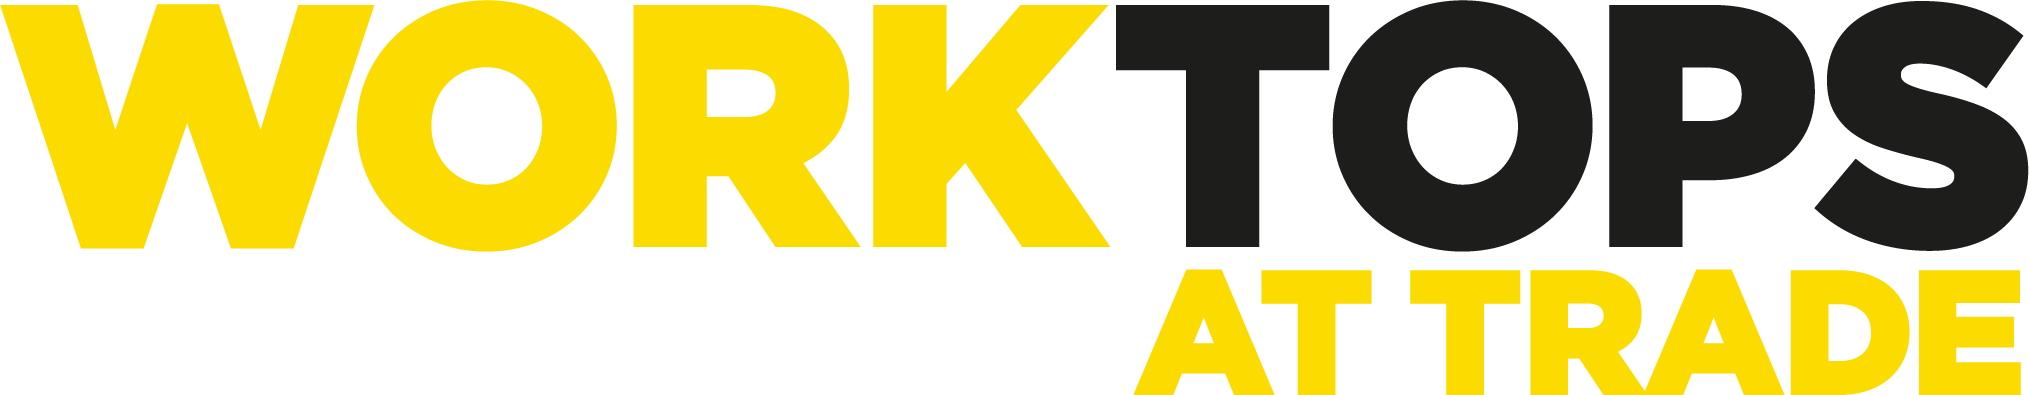 Worktops at Trade logo